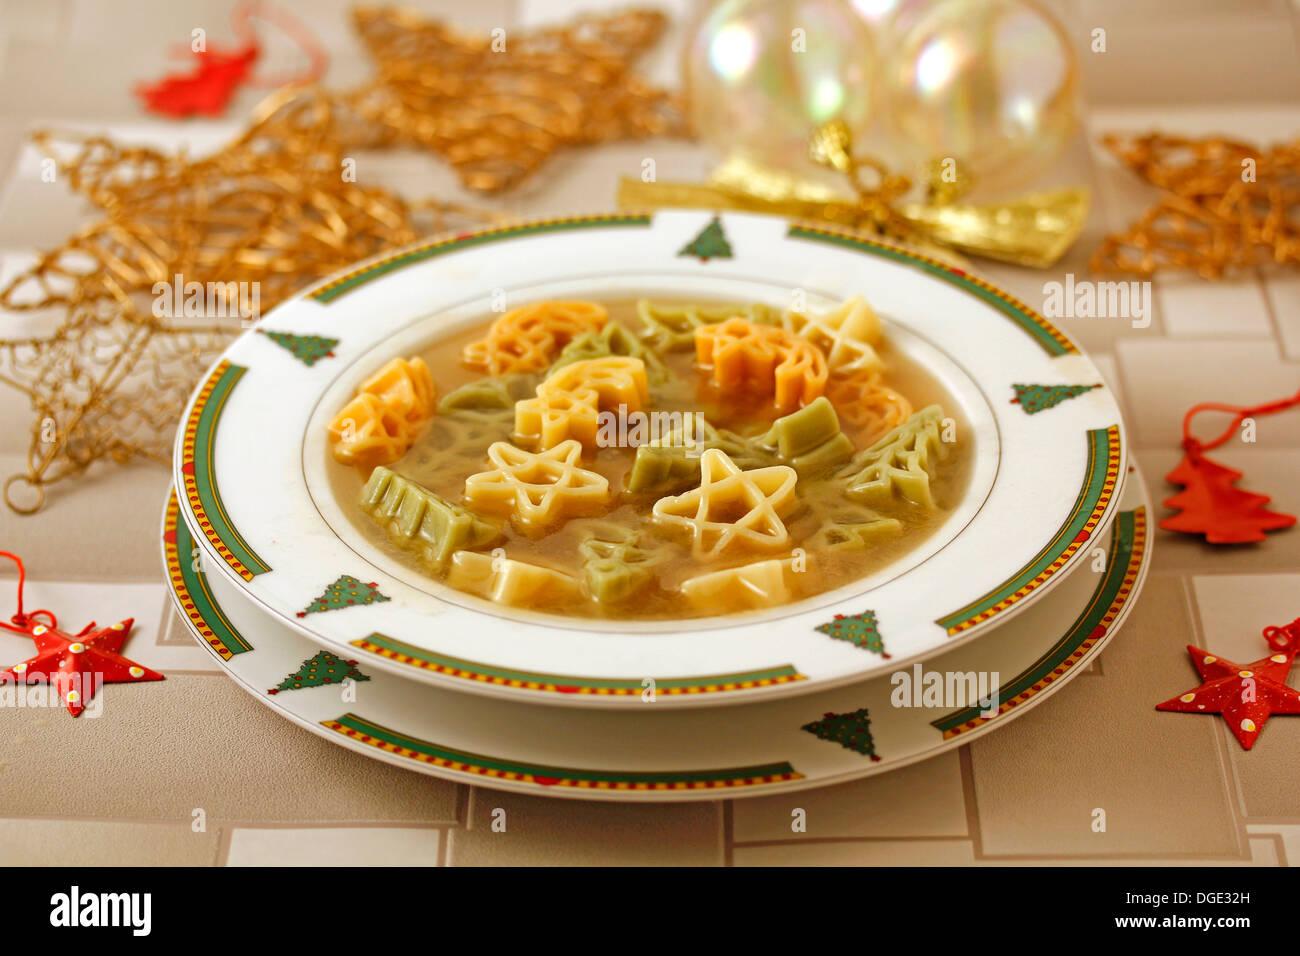 Minestra Di Natale.Zuppa Di Natale Immagini Zuppa Di Natale Fotos Stock Alamy